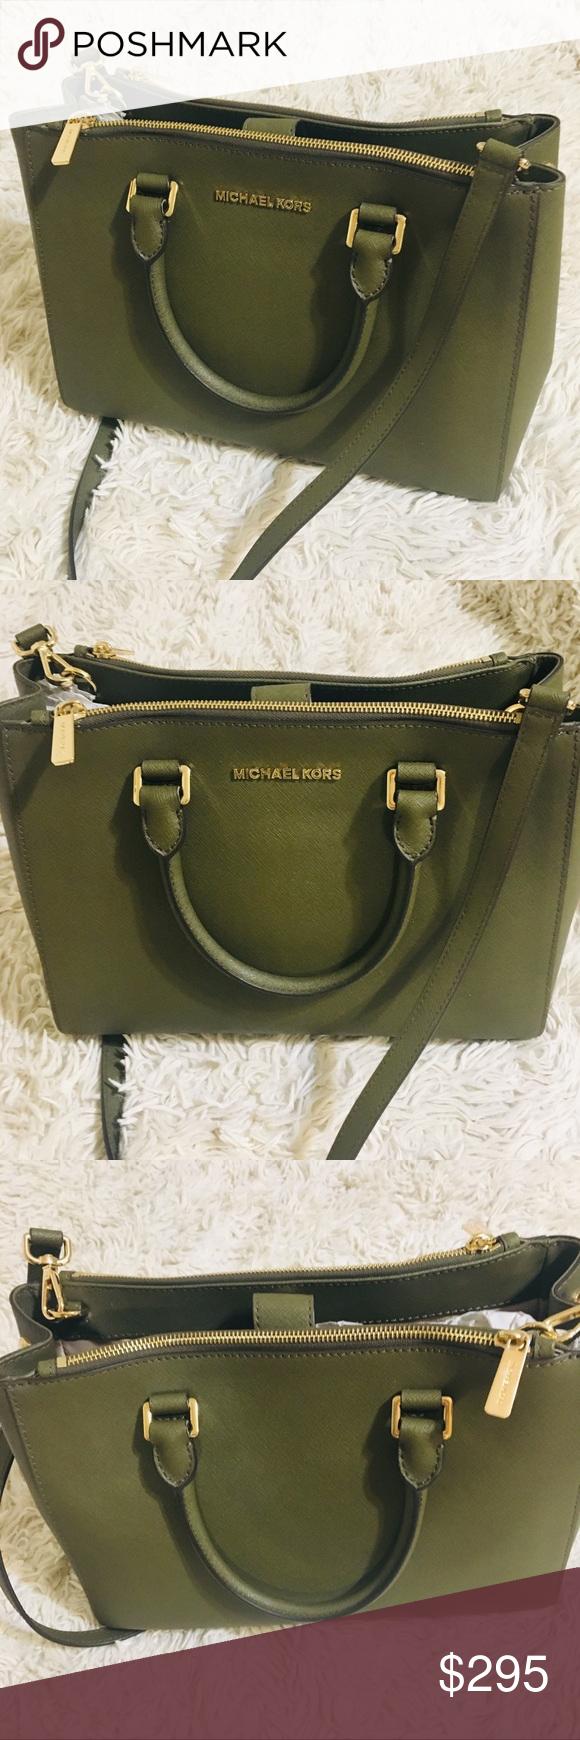 d49623547d NEW Michael Kors Tote Olive Green w/ Dust Bag Incredible MK shoulder bag  with detachable